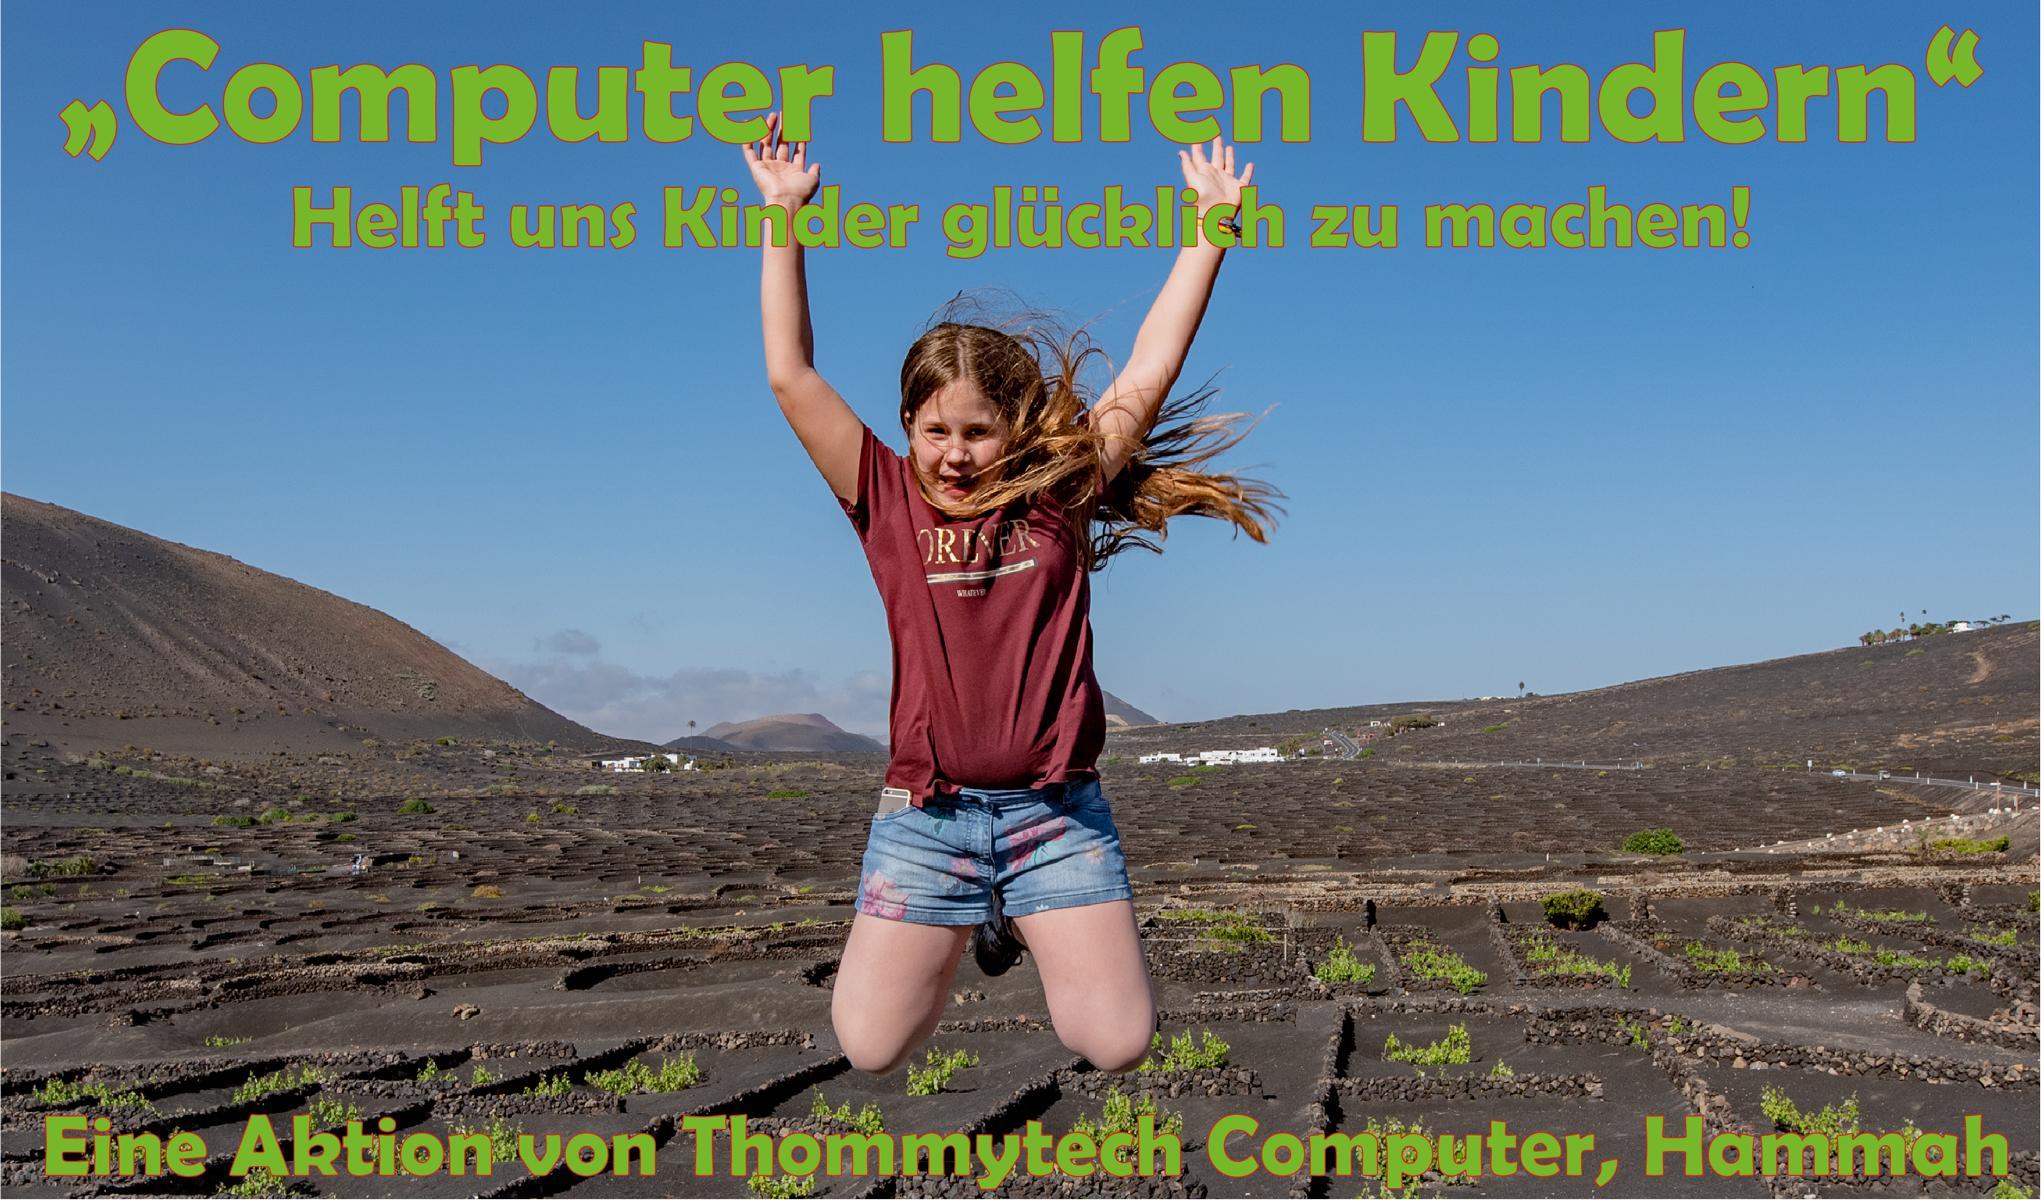 Computer helfen Kindern